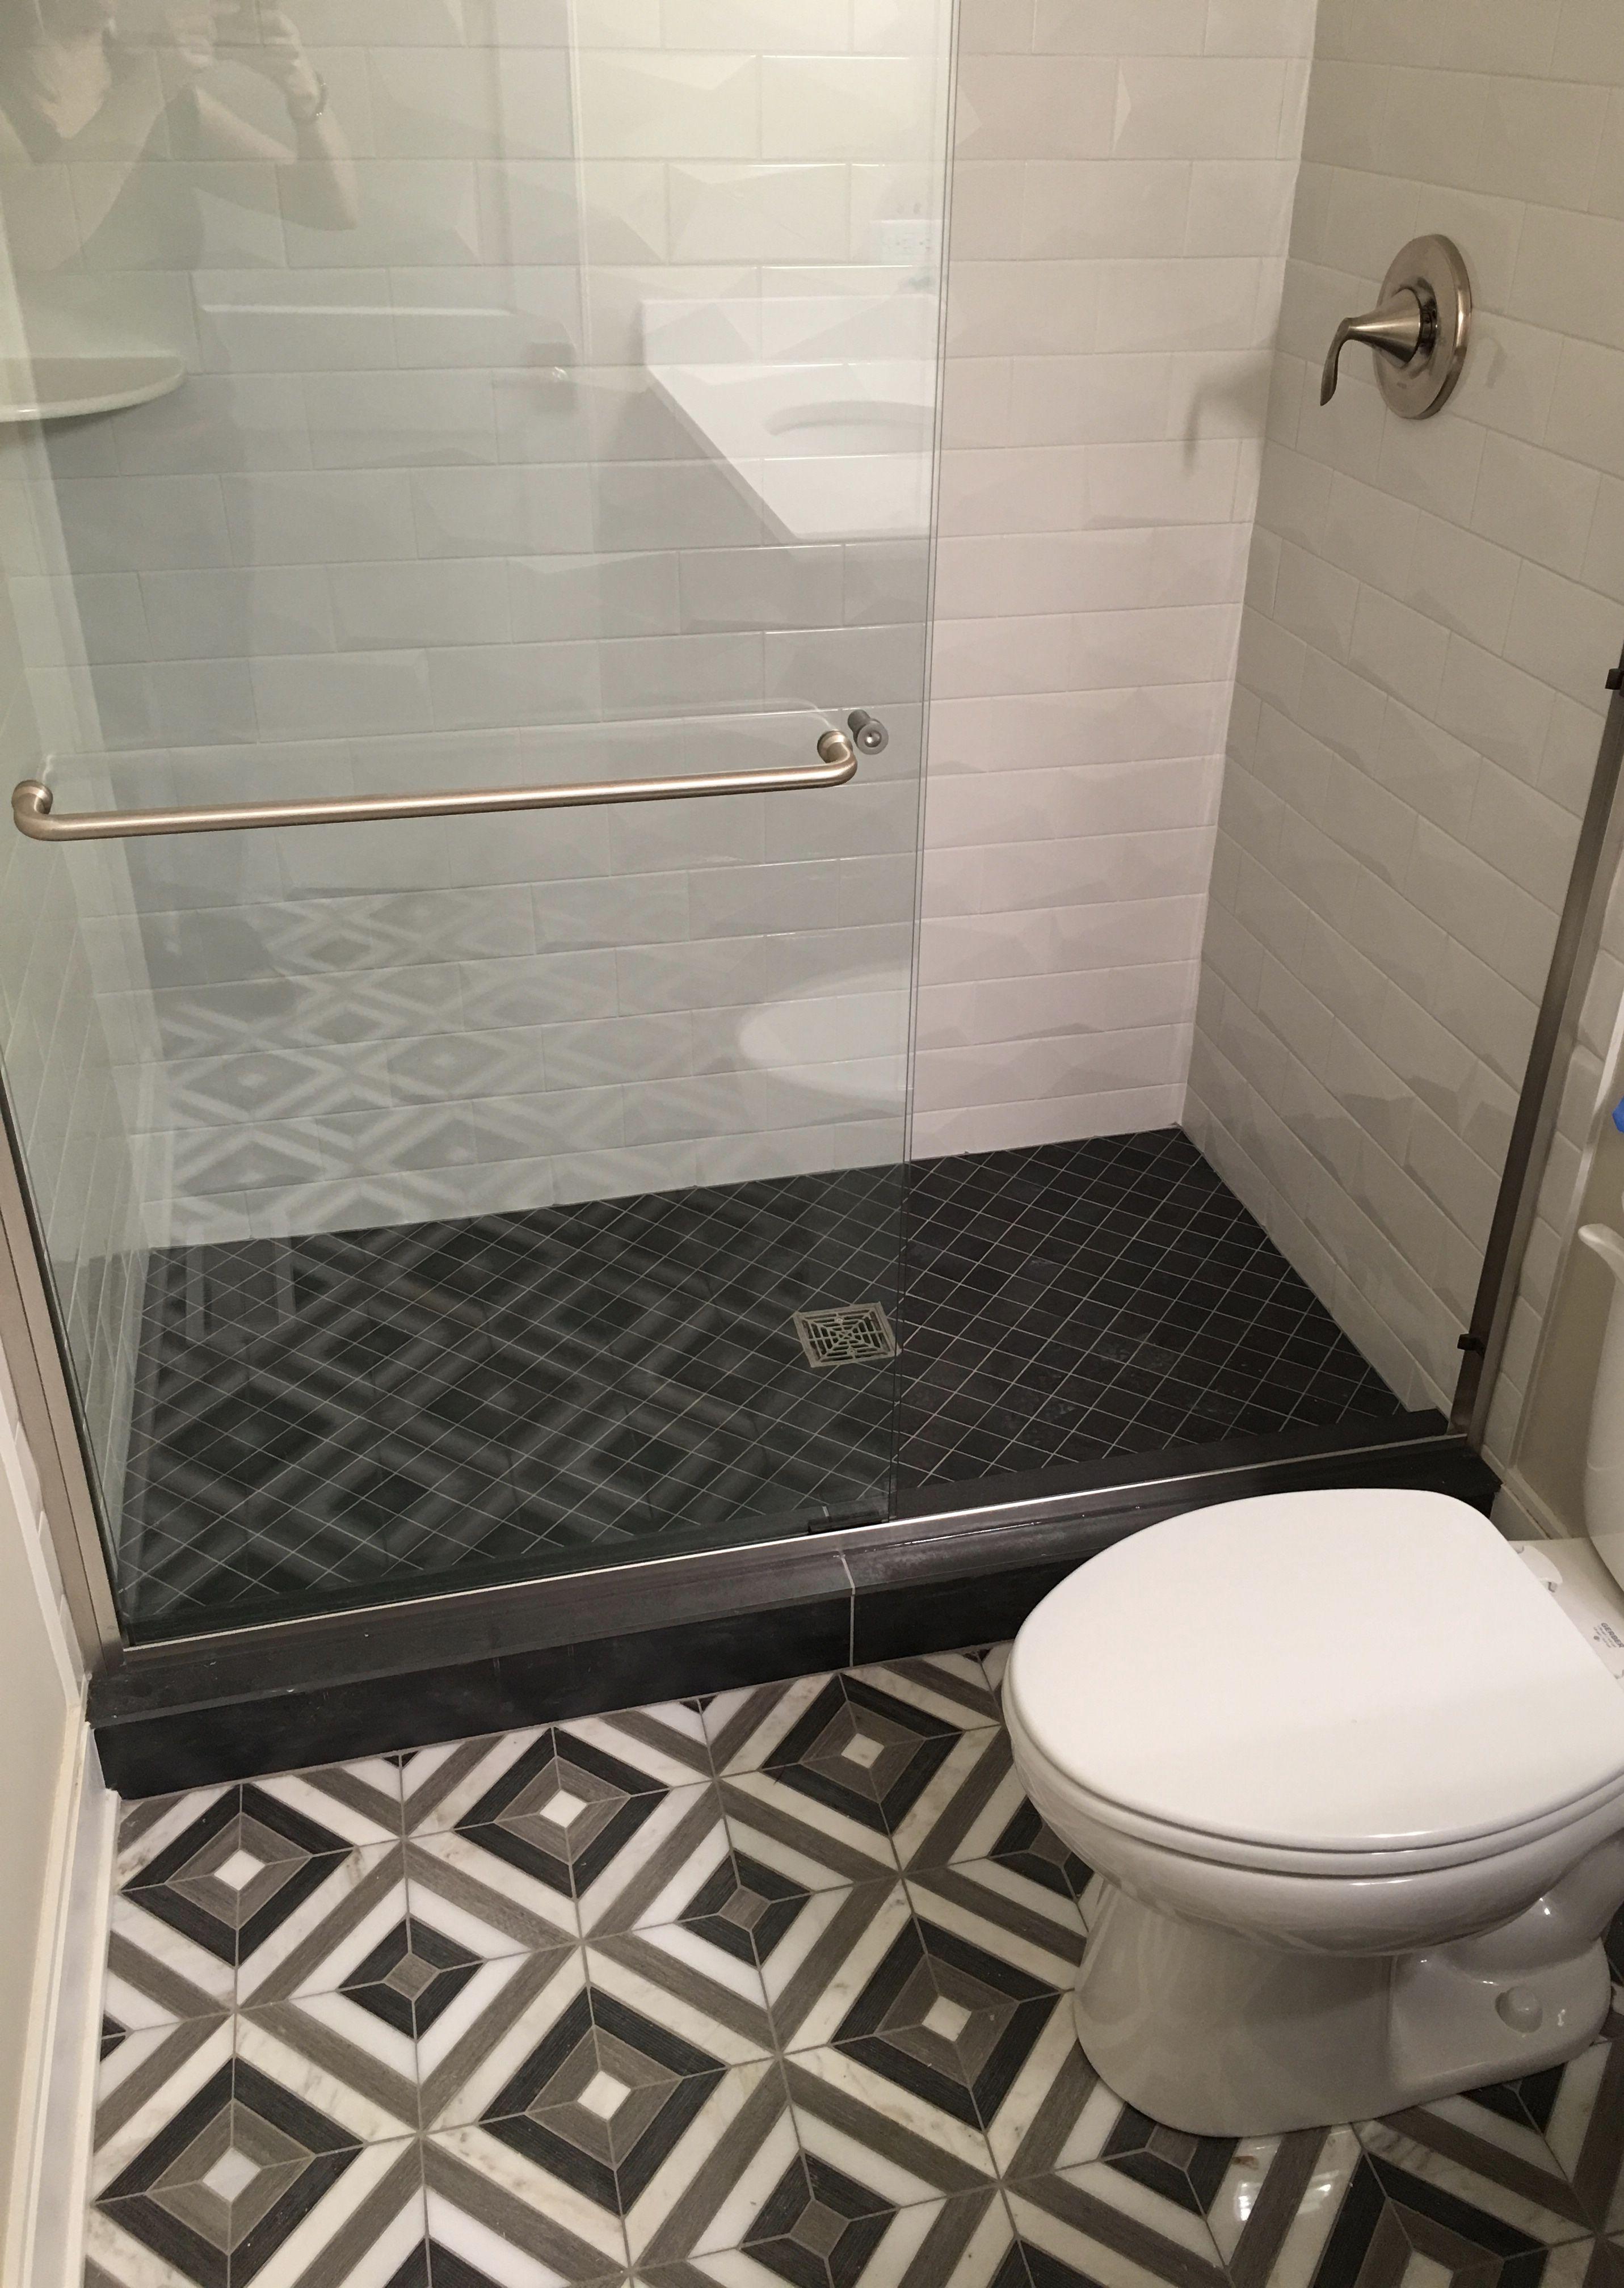 Mira Grey Mosaic Hexagonal Topps Tiles Shower Floor Tile Shower Floor Bathroom Floor Tiles